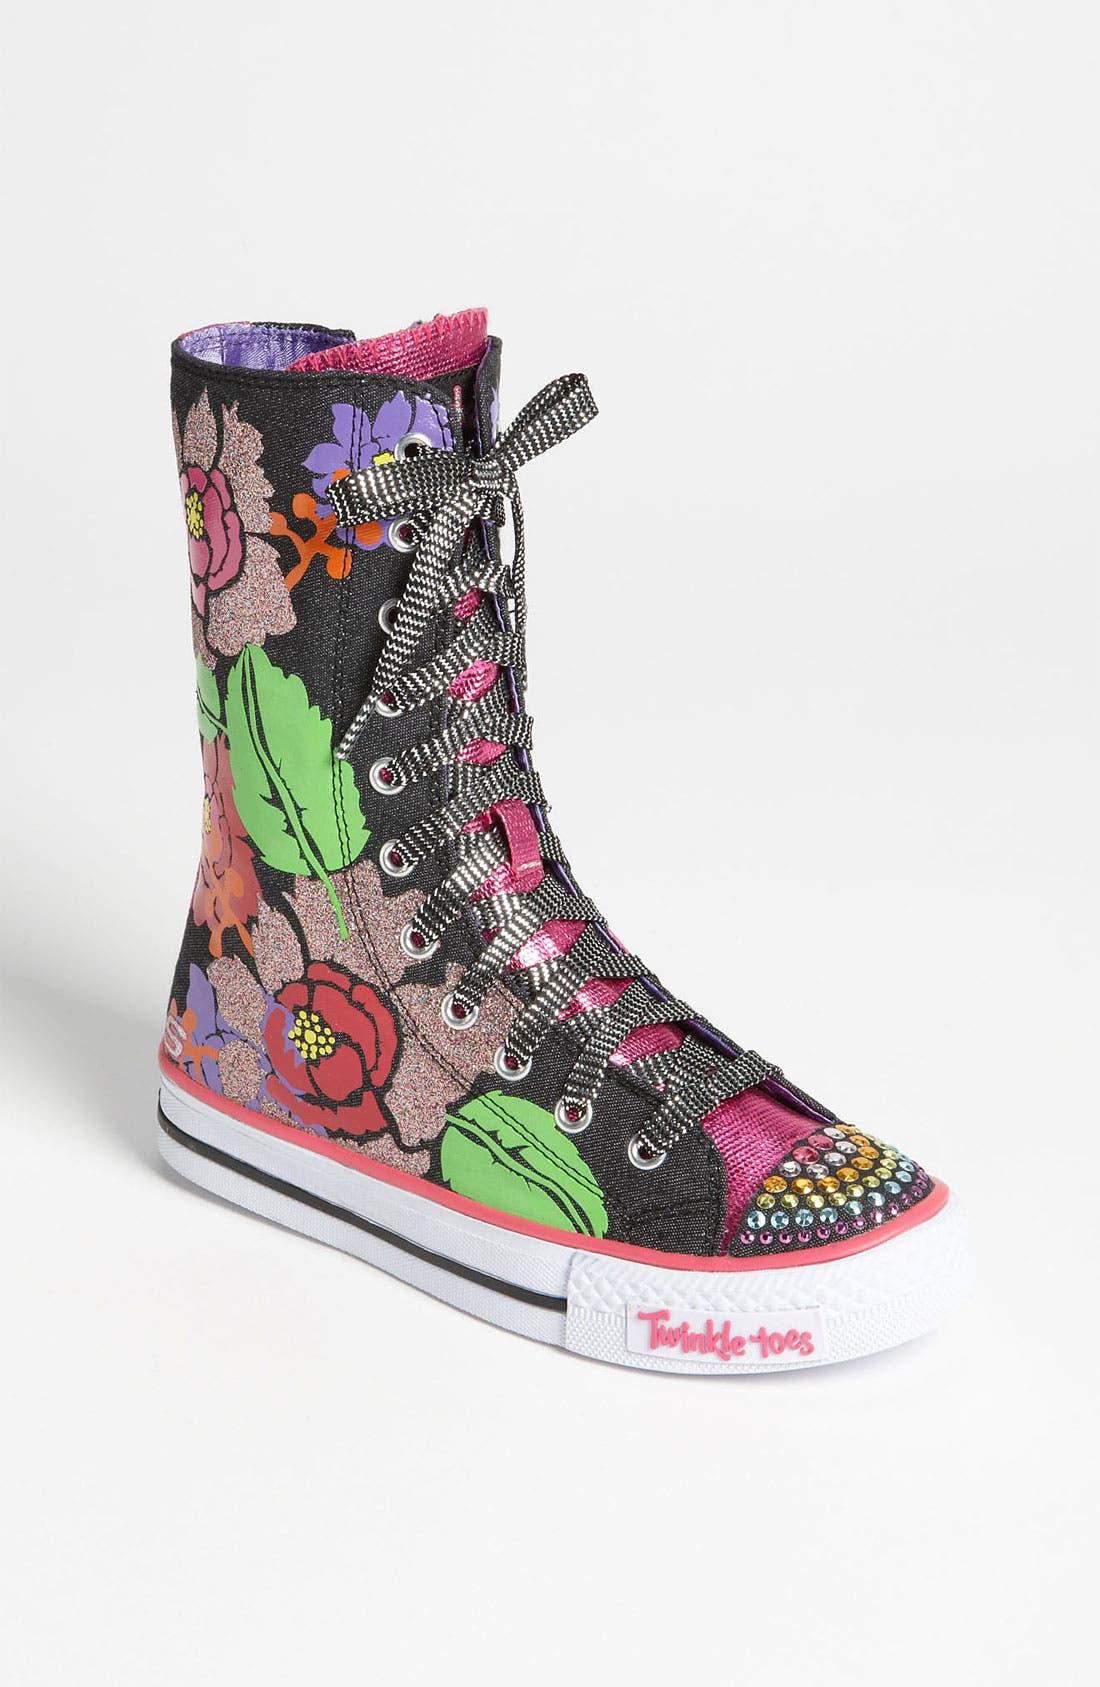 Alternate Image 1 Selected - SKECHERS 'Twinkle Toes - Shuffles Love Stories' Sneaker (Toddler & Little Kid)